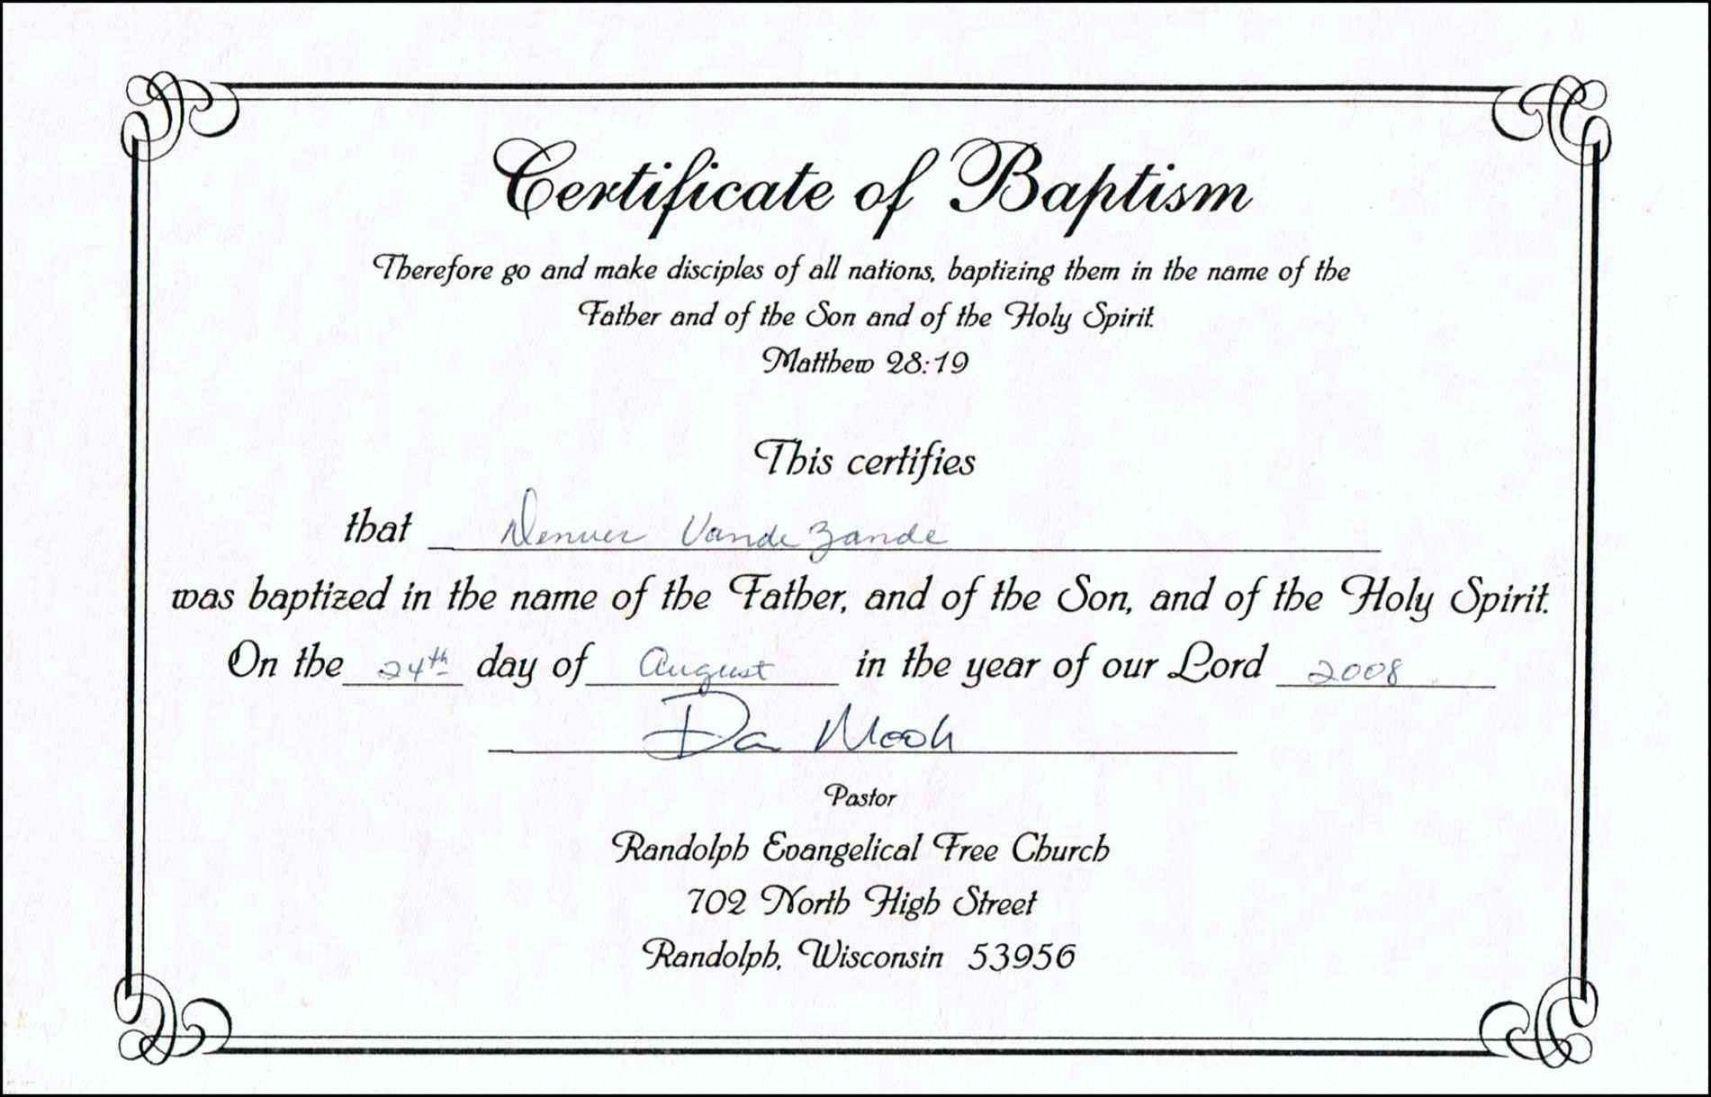 Get Our Free Baptist Baptism Certificate Template Certificate Templates Baby Dedication Certificate Birth Certificate Template